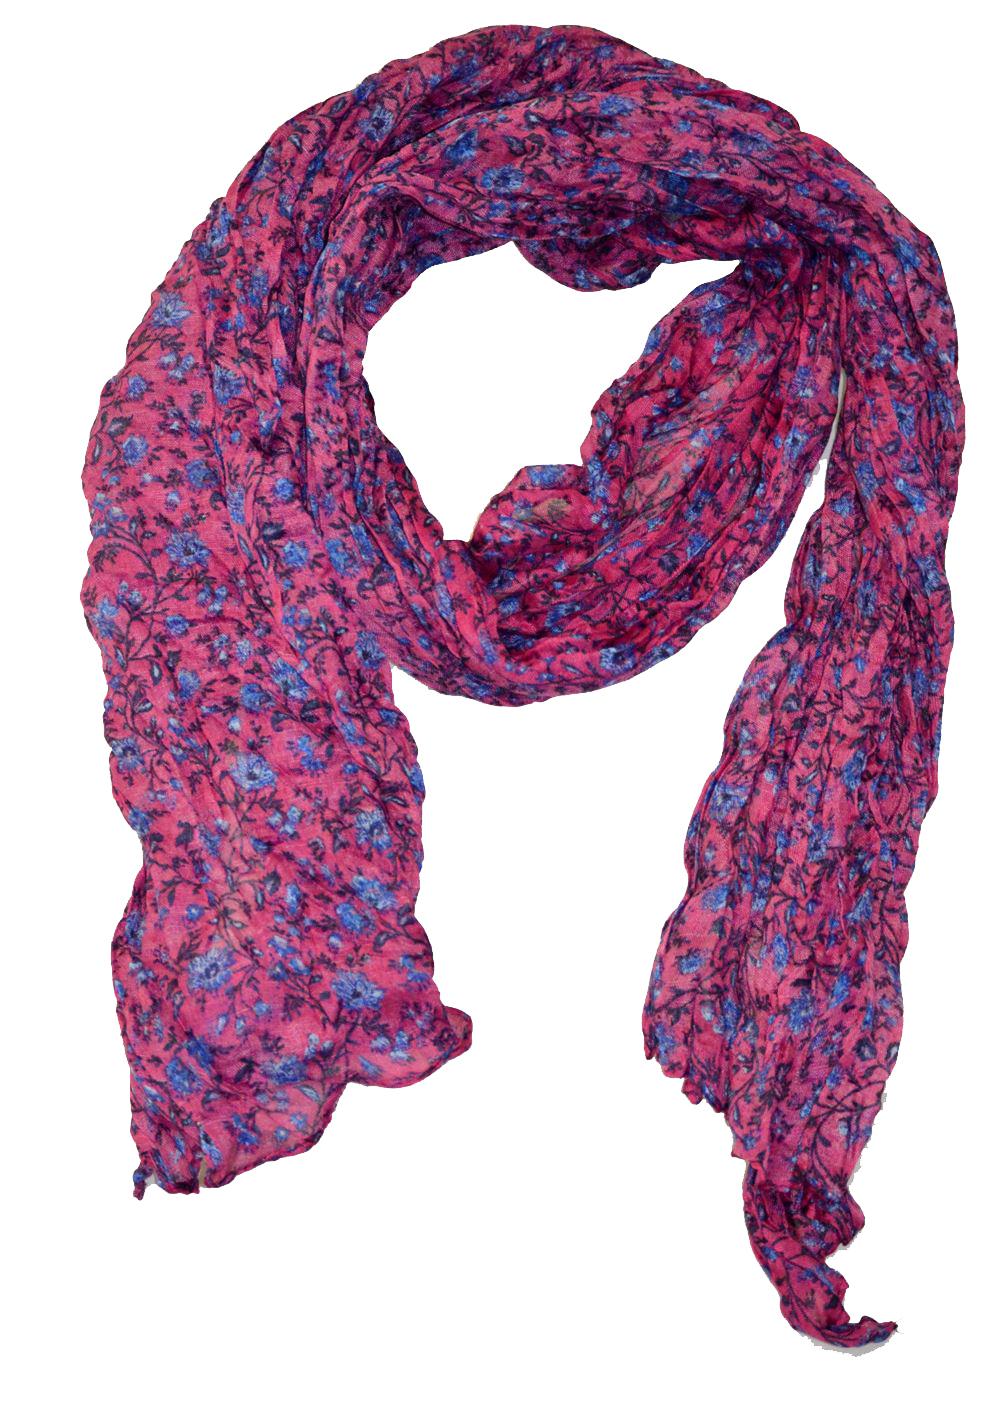 Belle Donne - women Scarf - Hot Pink Spring Sheer Floral Print Scarf